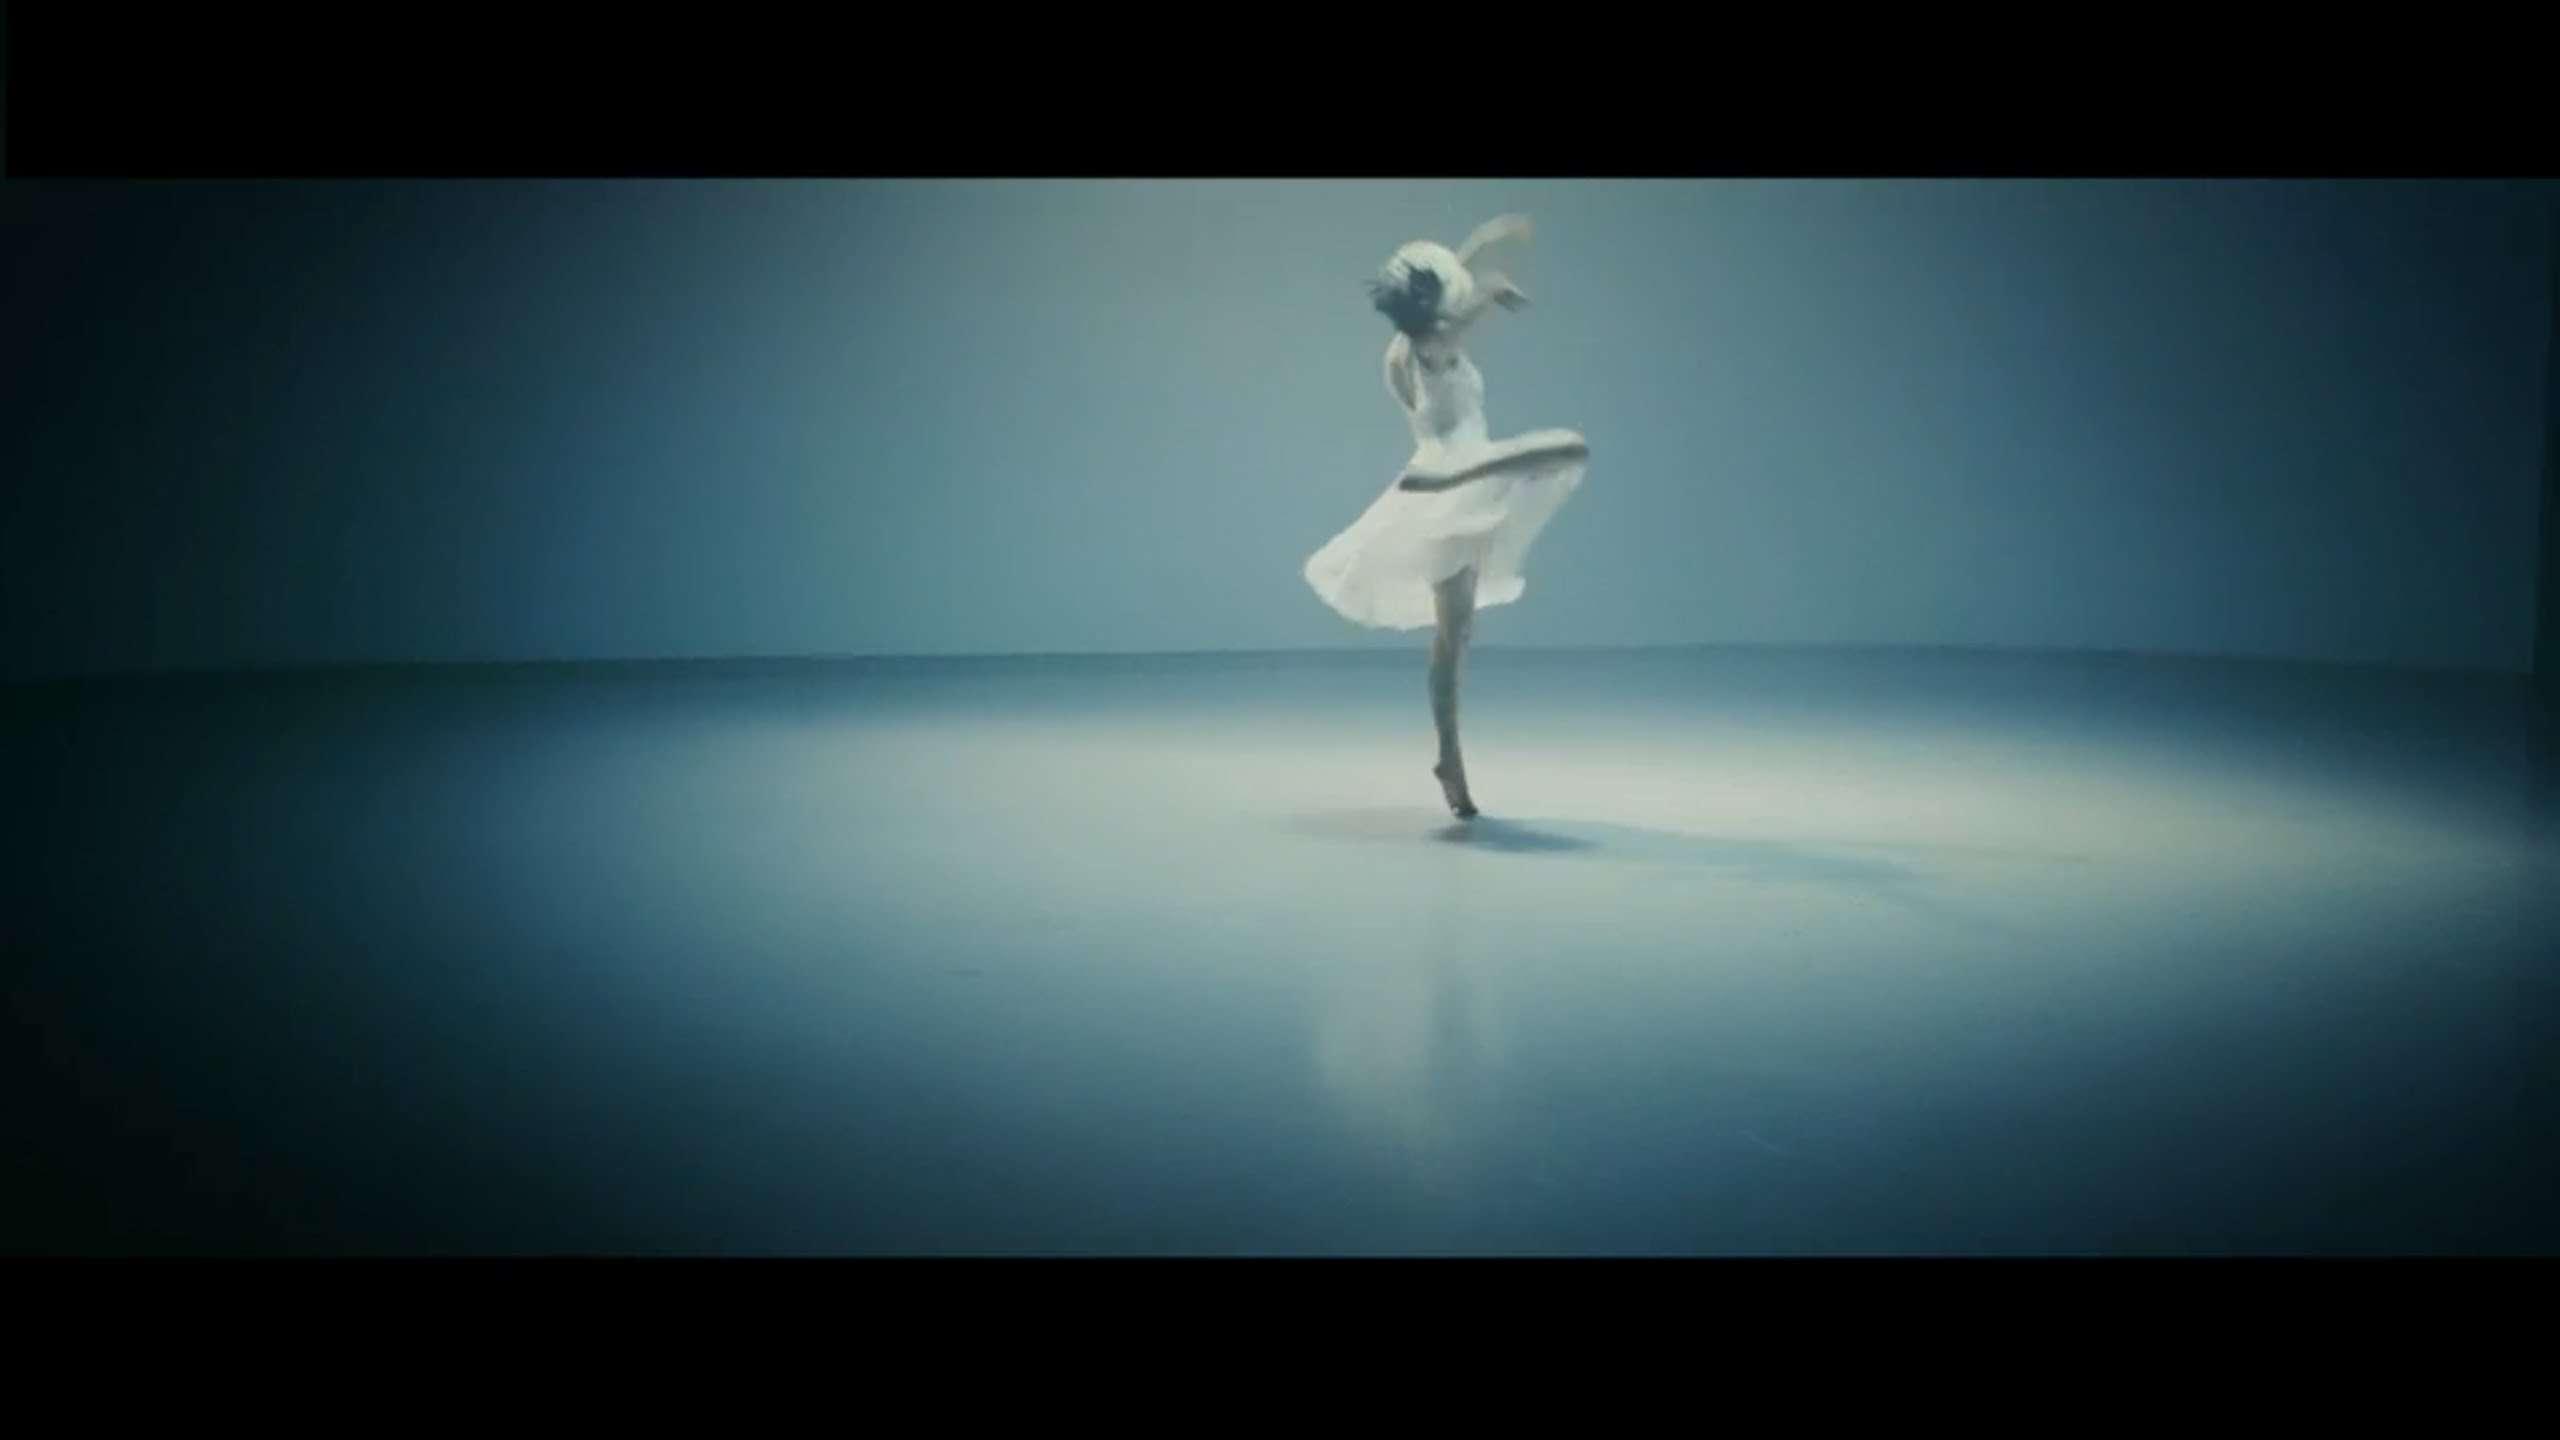 Sia 『アライヴ feat. 土屋太鳳 / Alive feat. Tao Tsuchiya』 - YouTube